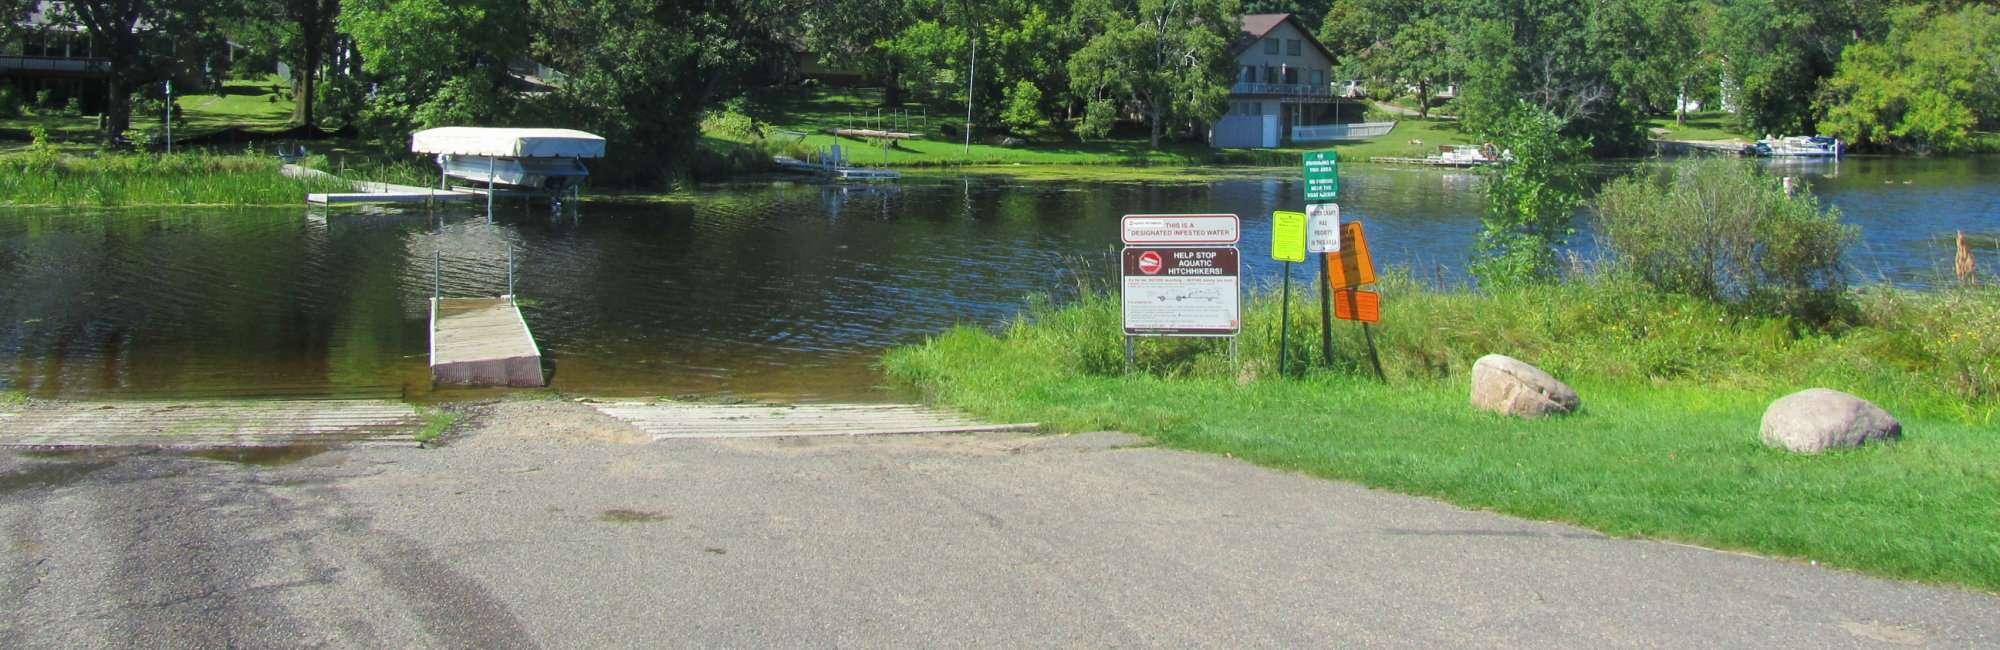 Slide-Recreation-Fishing-Public-Landings